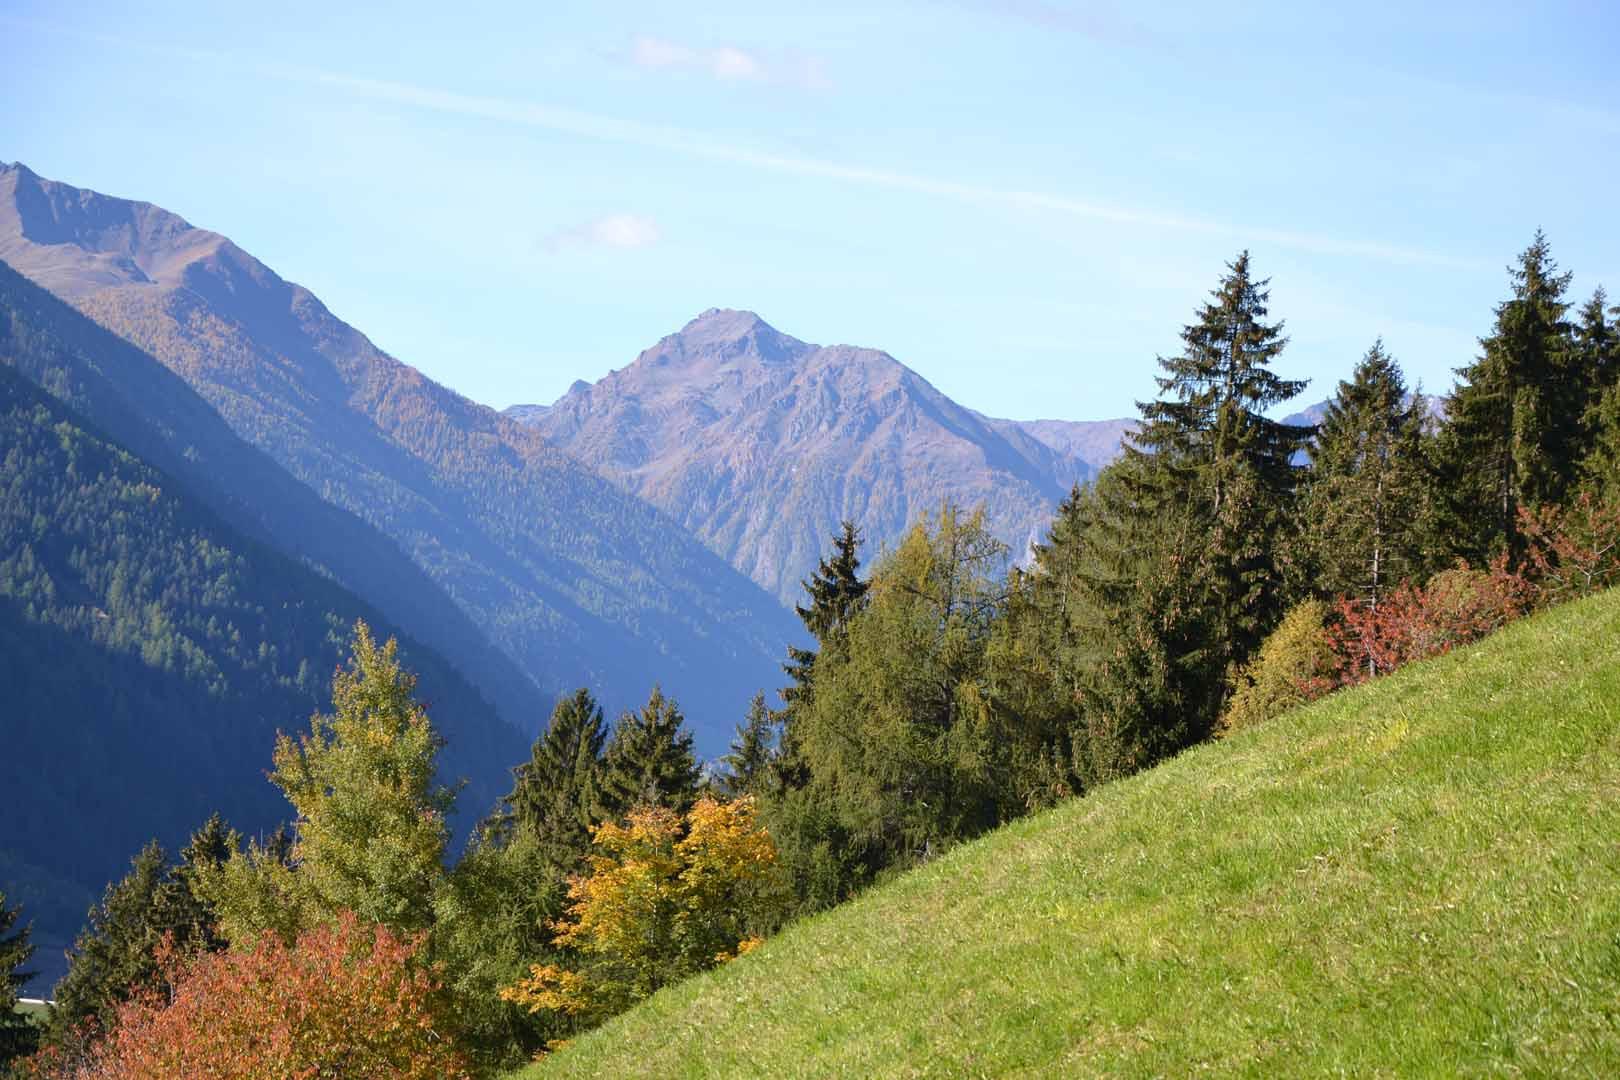 Häuselerhof_im_Ultental_6.jpg